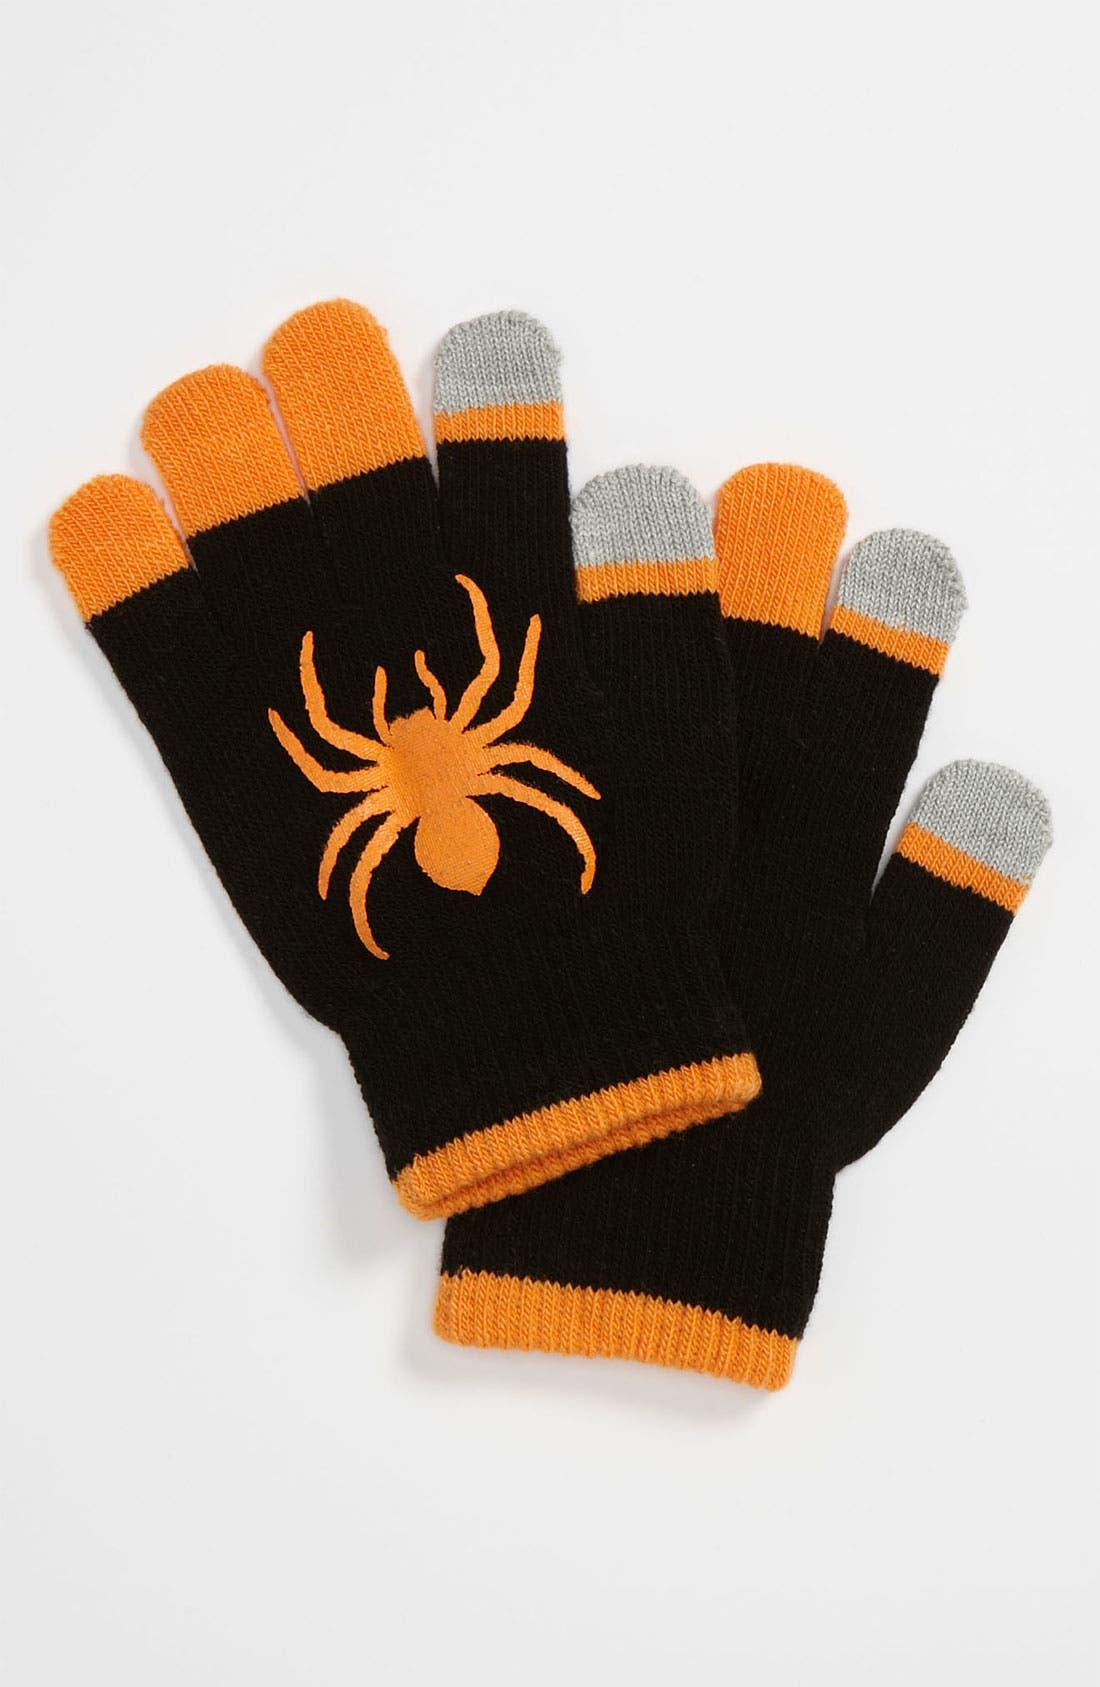 Alternate Image 1 Selected - Nolan Glove 'Spider' Gloves (Little Boys)